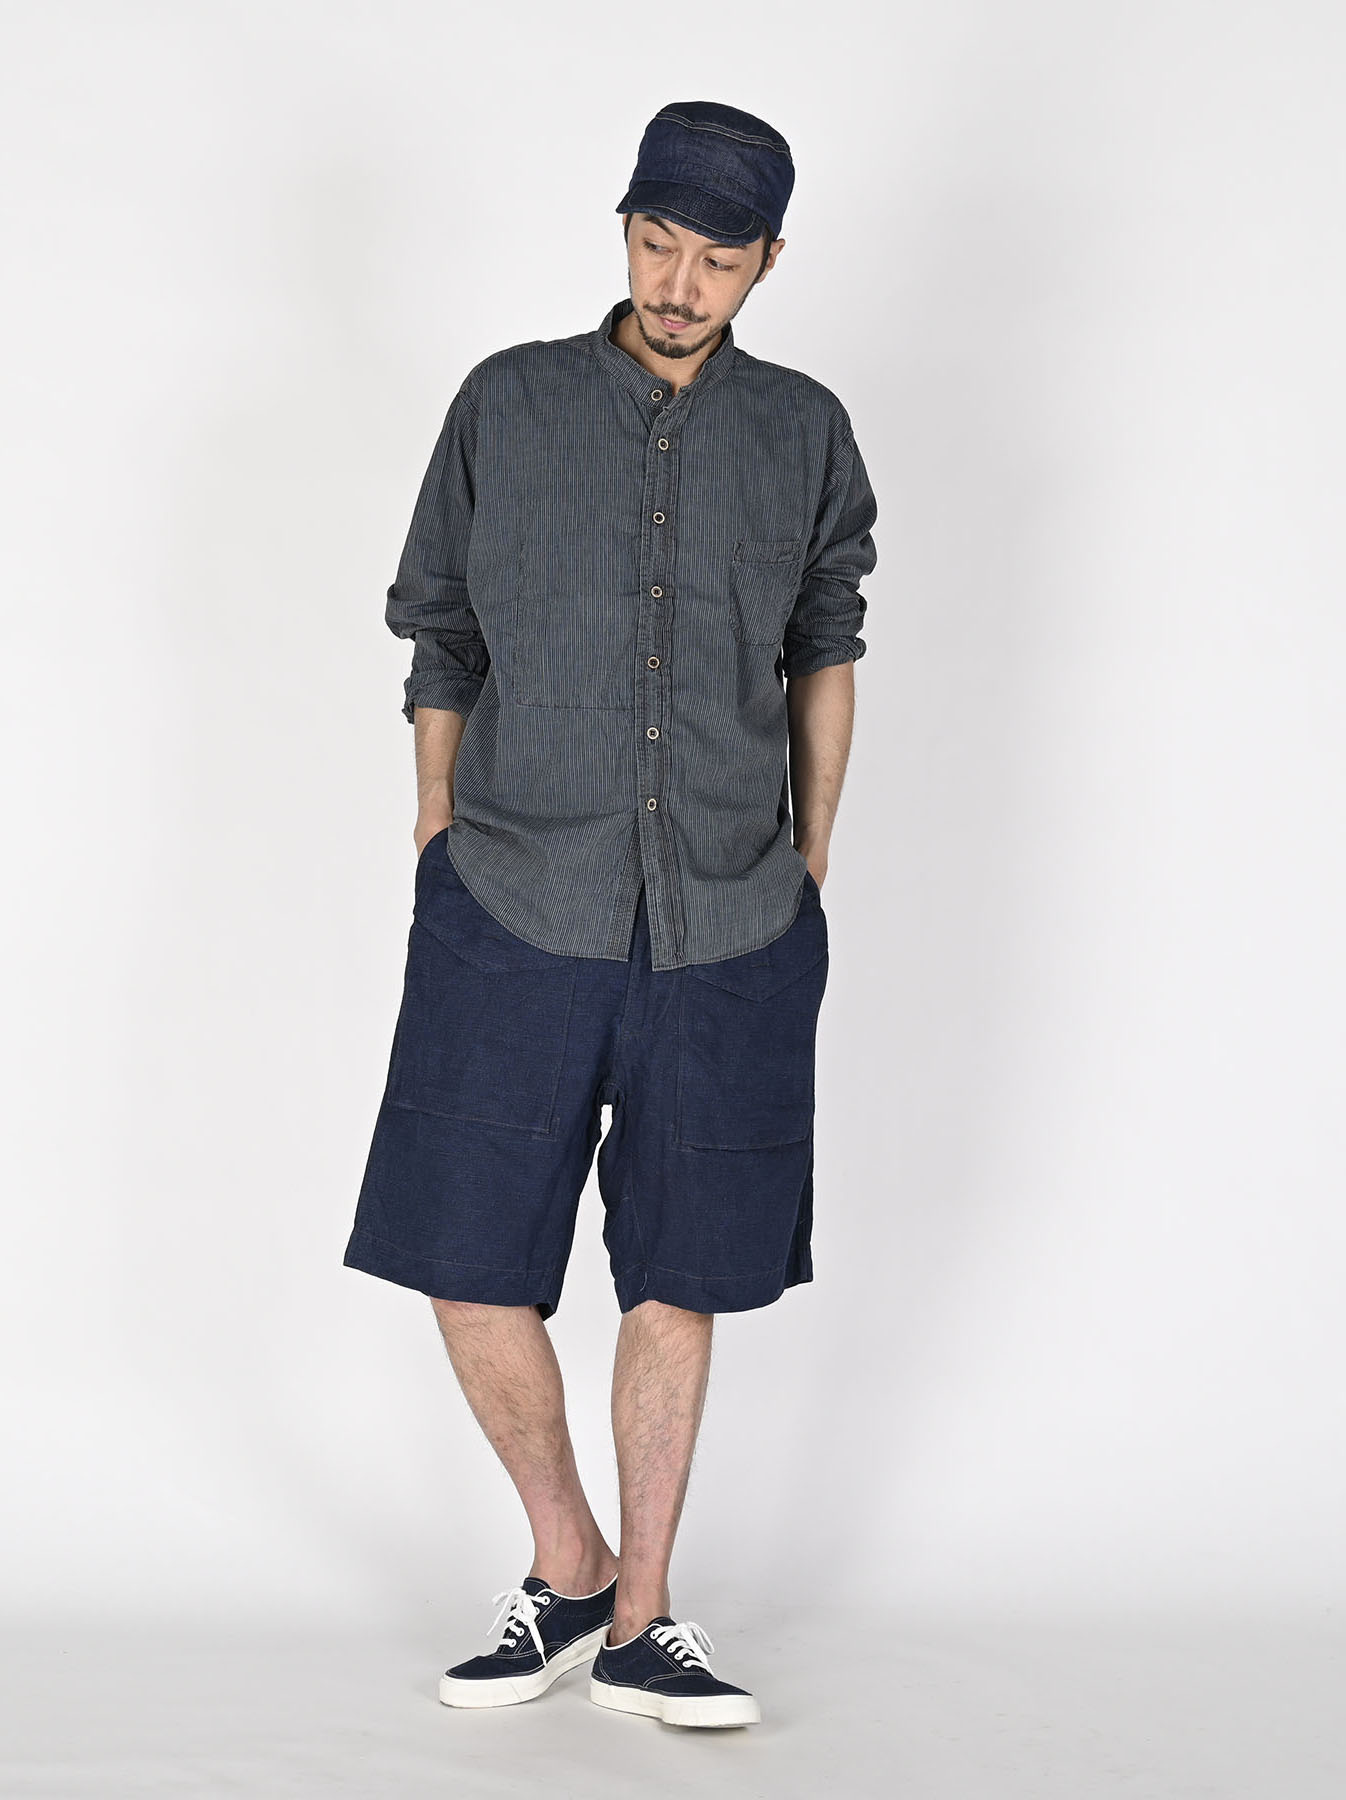 Indigo Hickory Tappet Ocean Stand Shirt-5